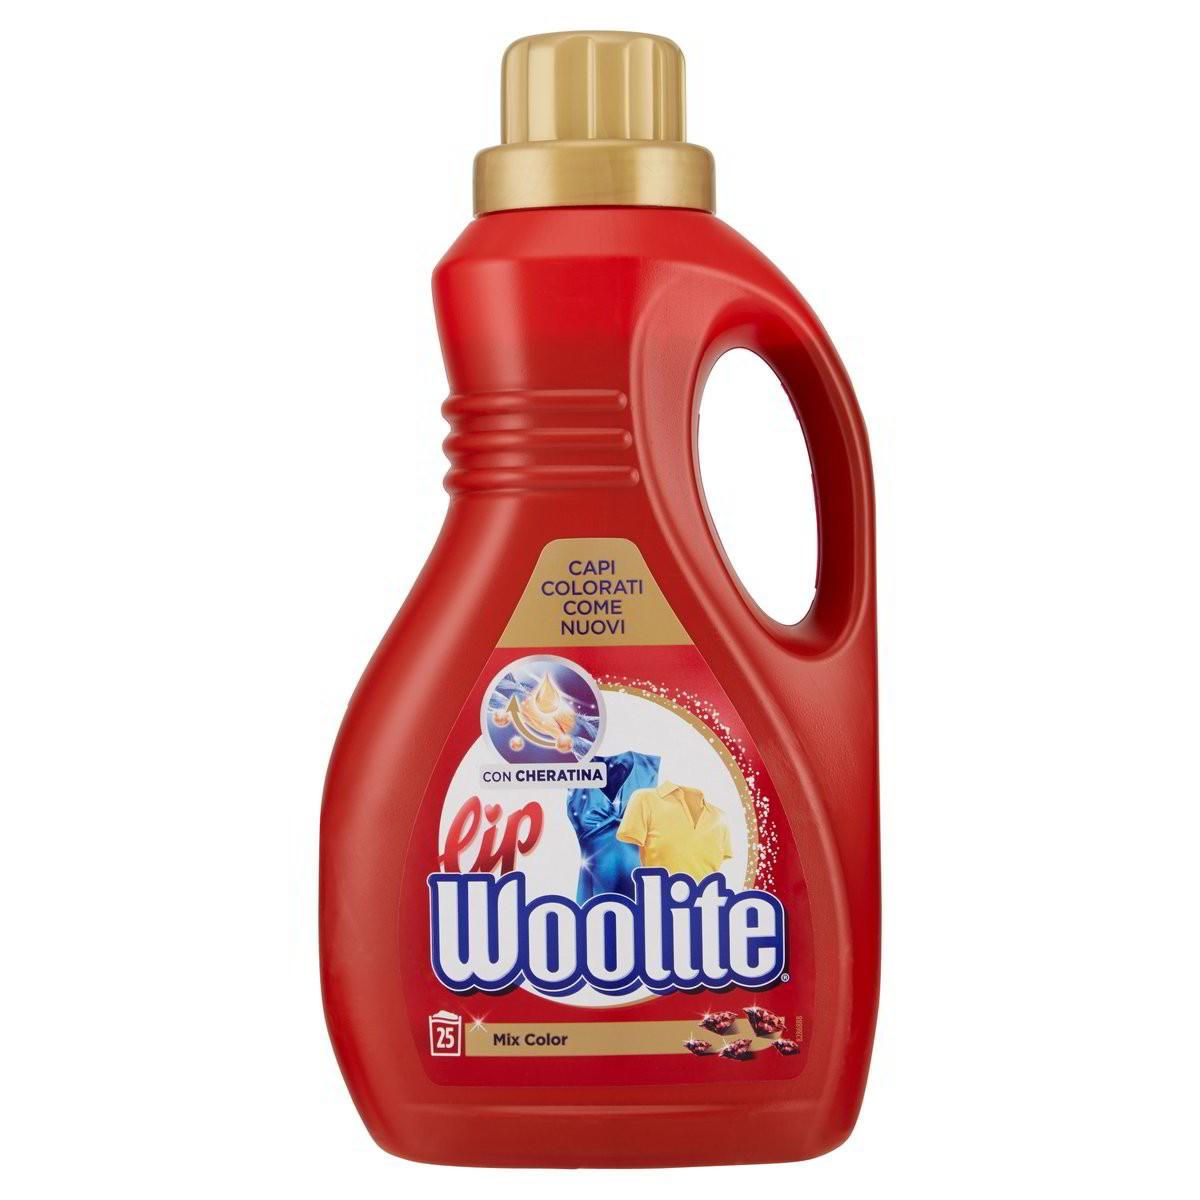 Lip Woolite Detersivo liquido per lavatrice